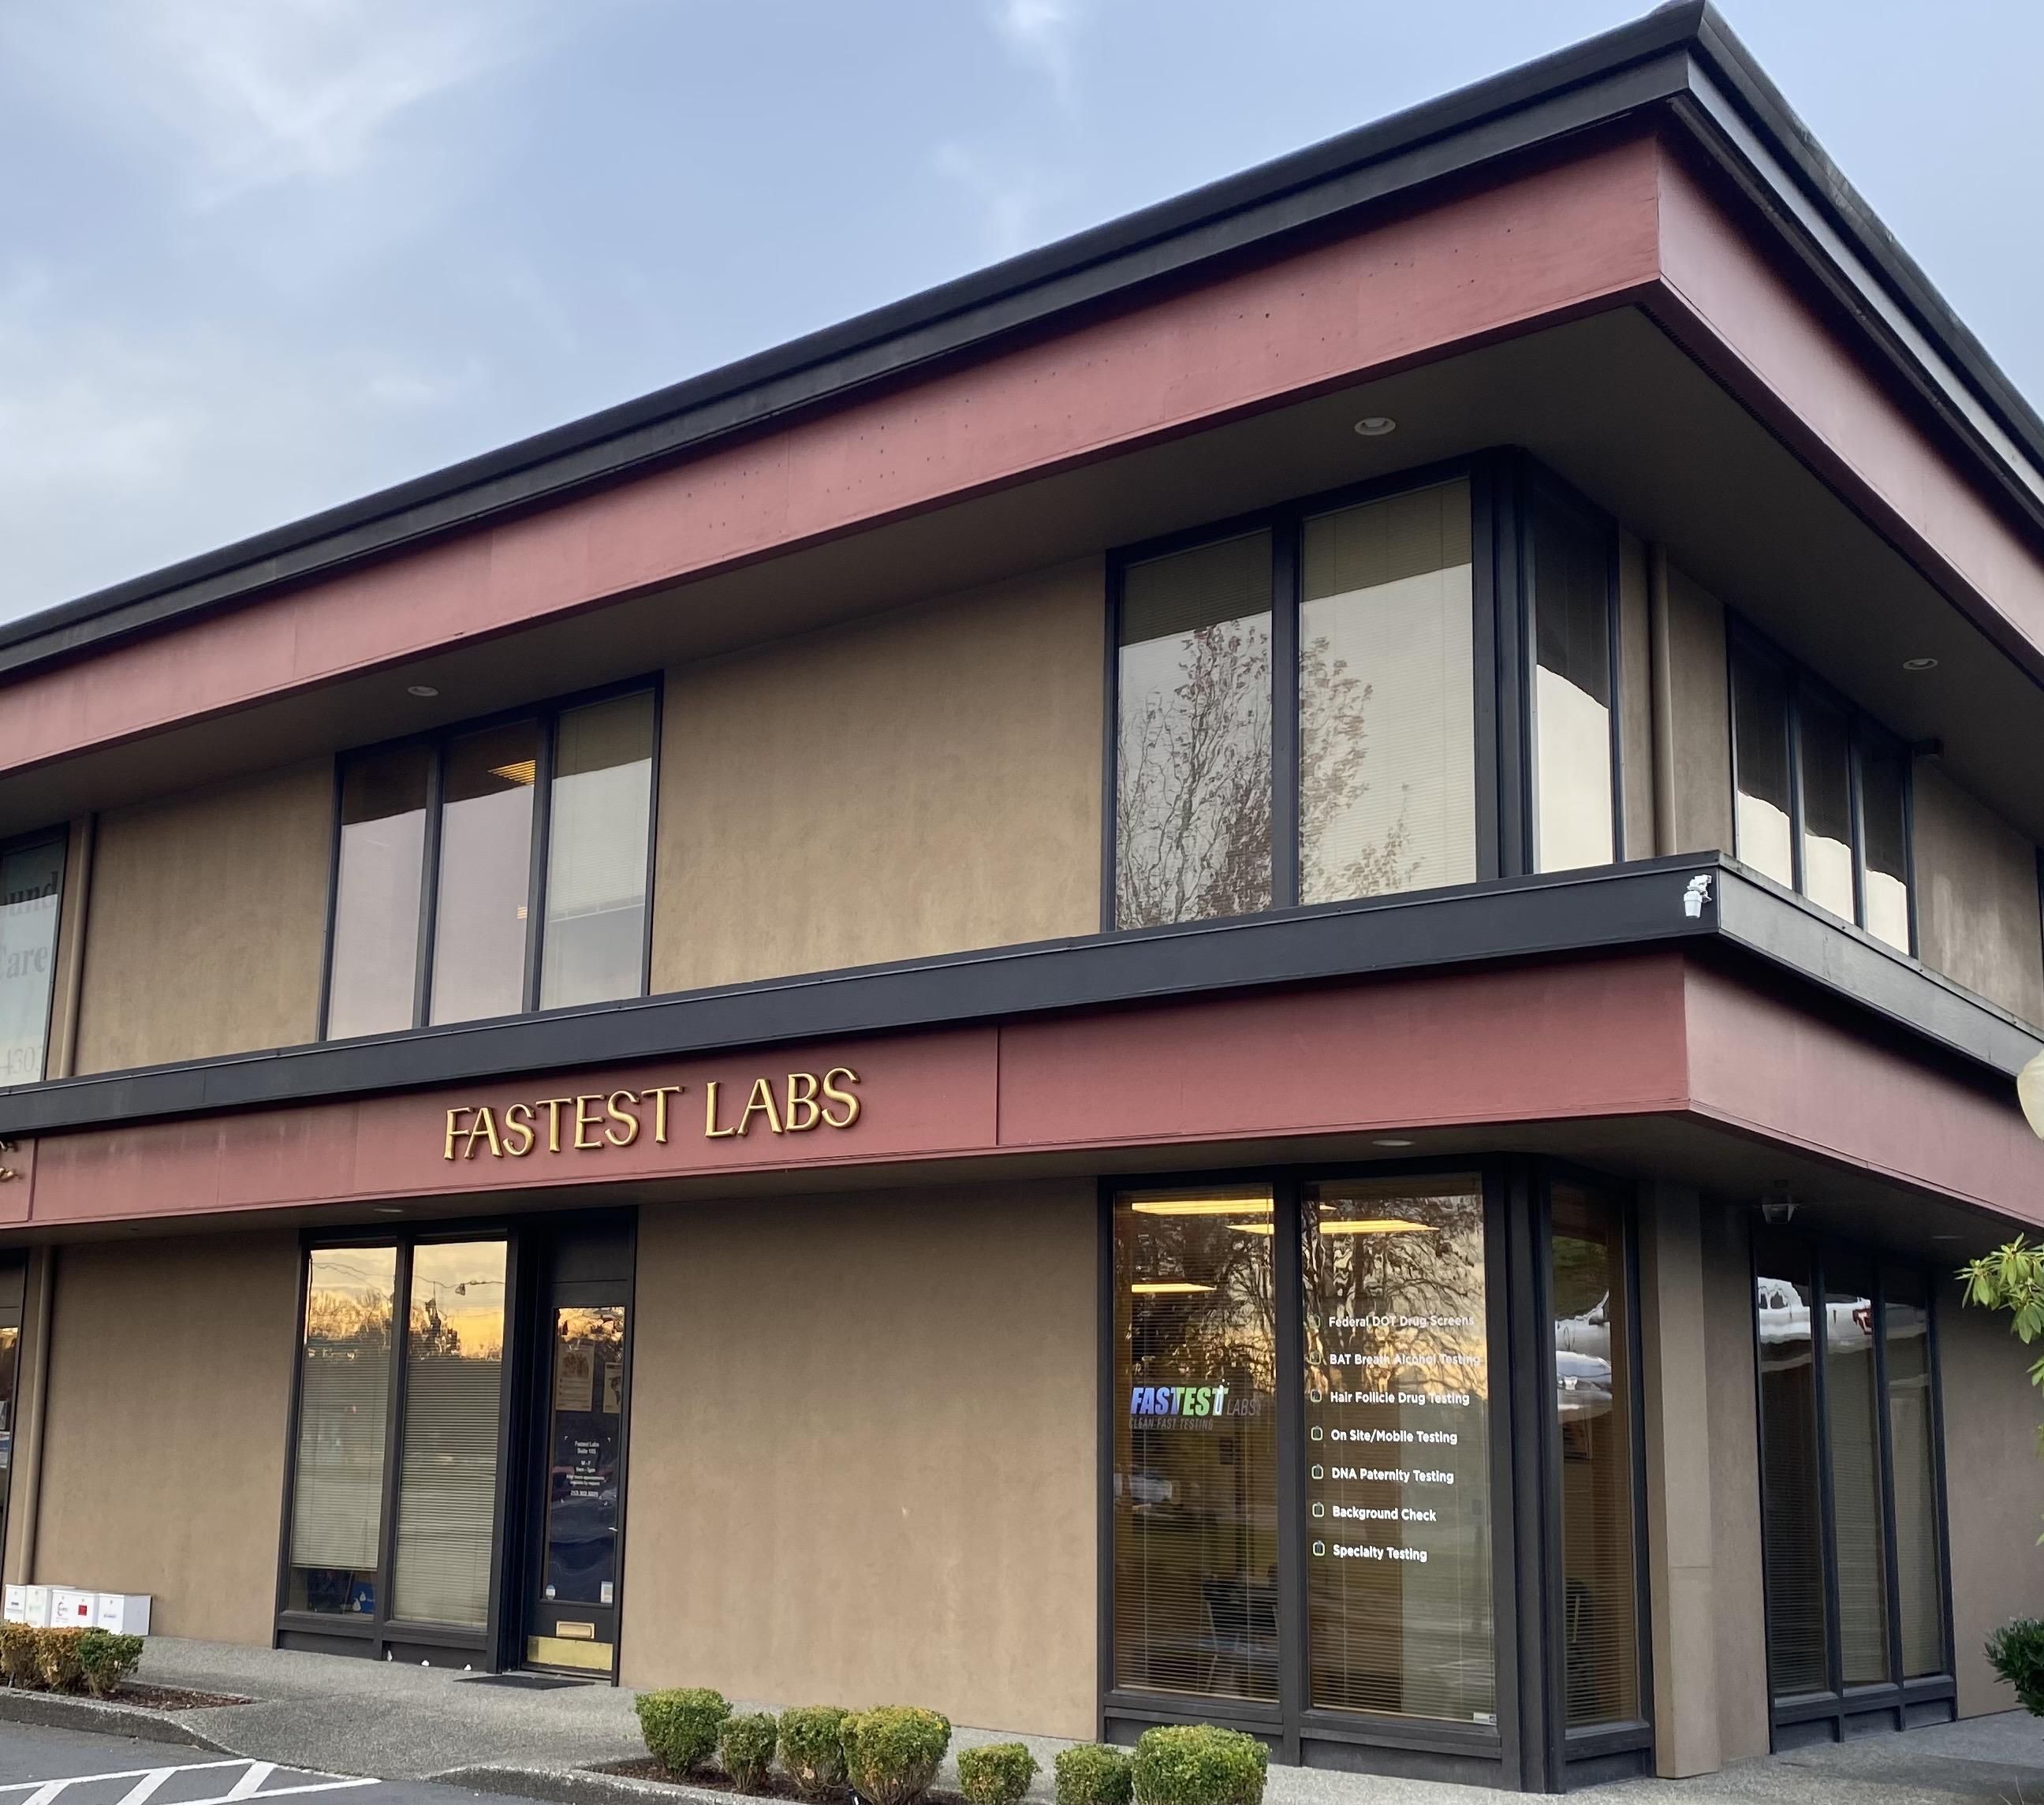 Fastest Labs of Tacoma entrance